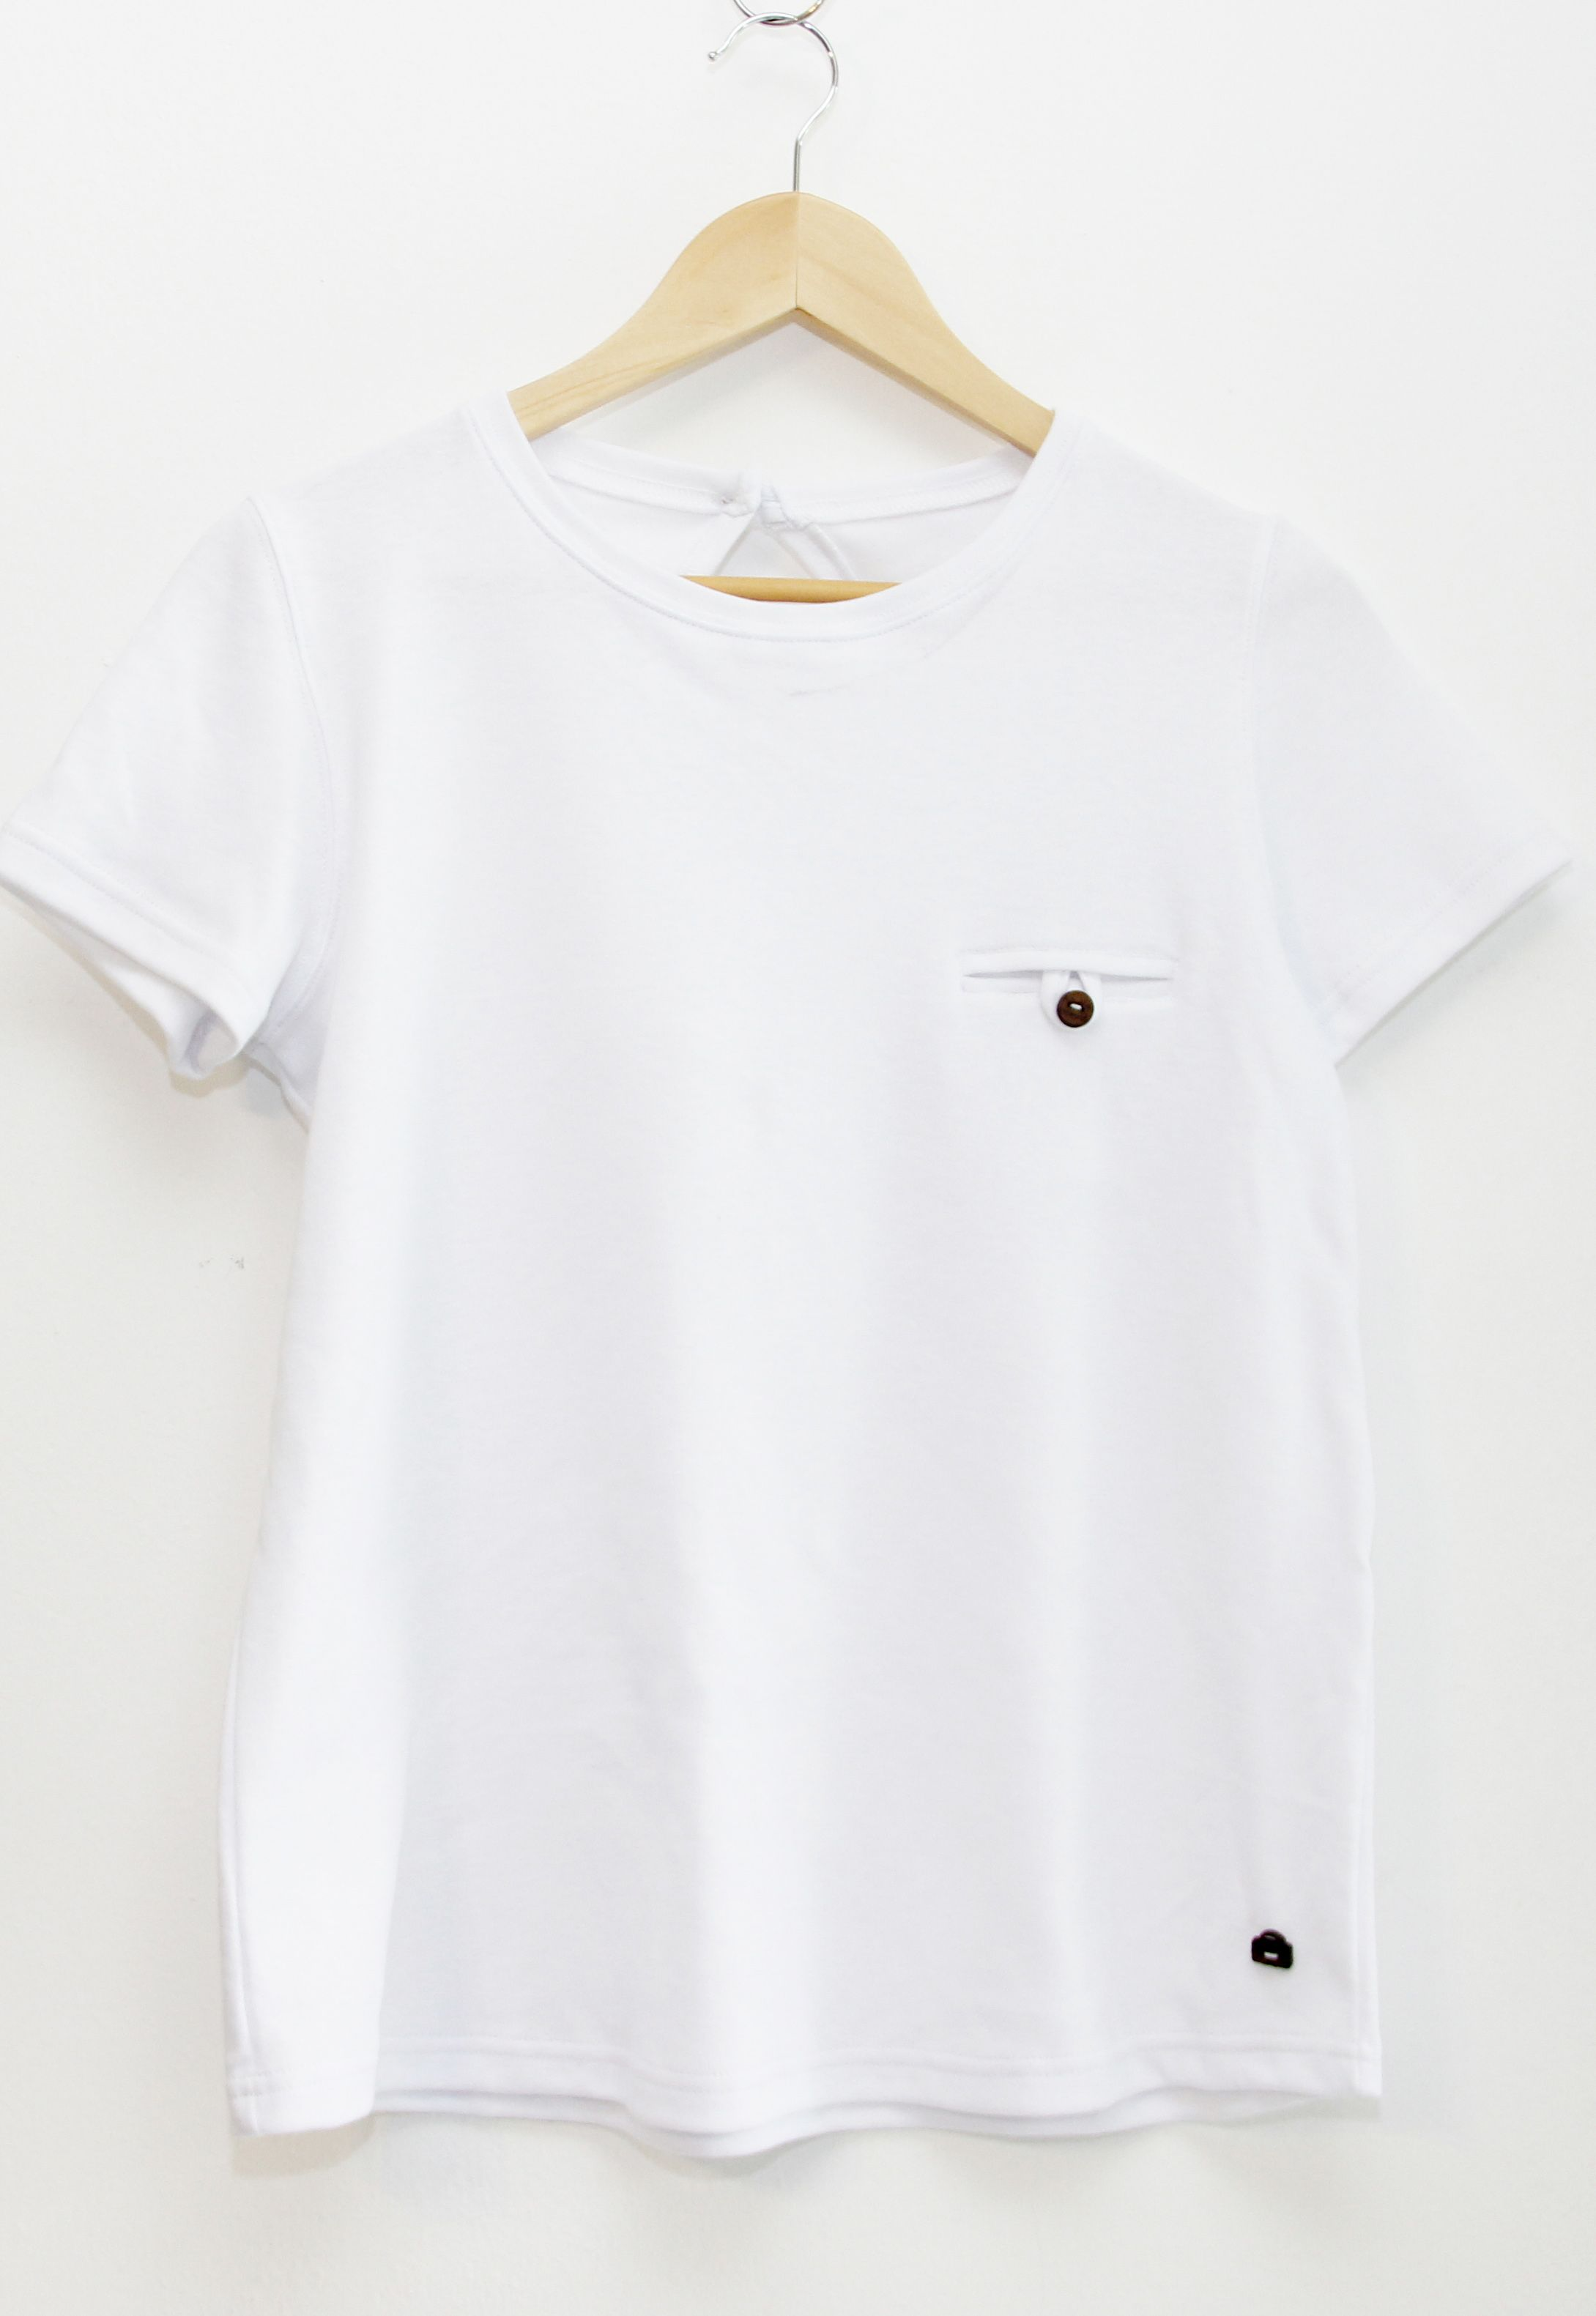 Remera blanca 100% algodón orgánico